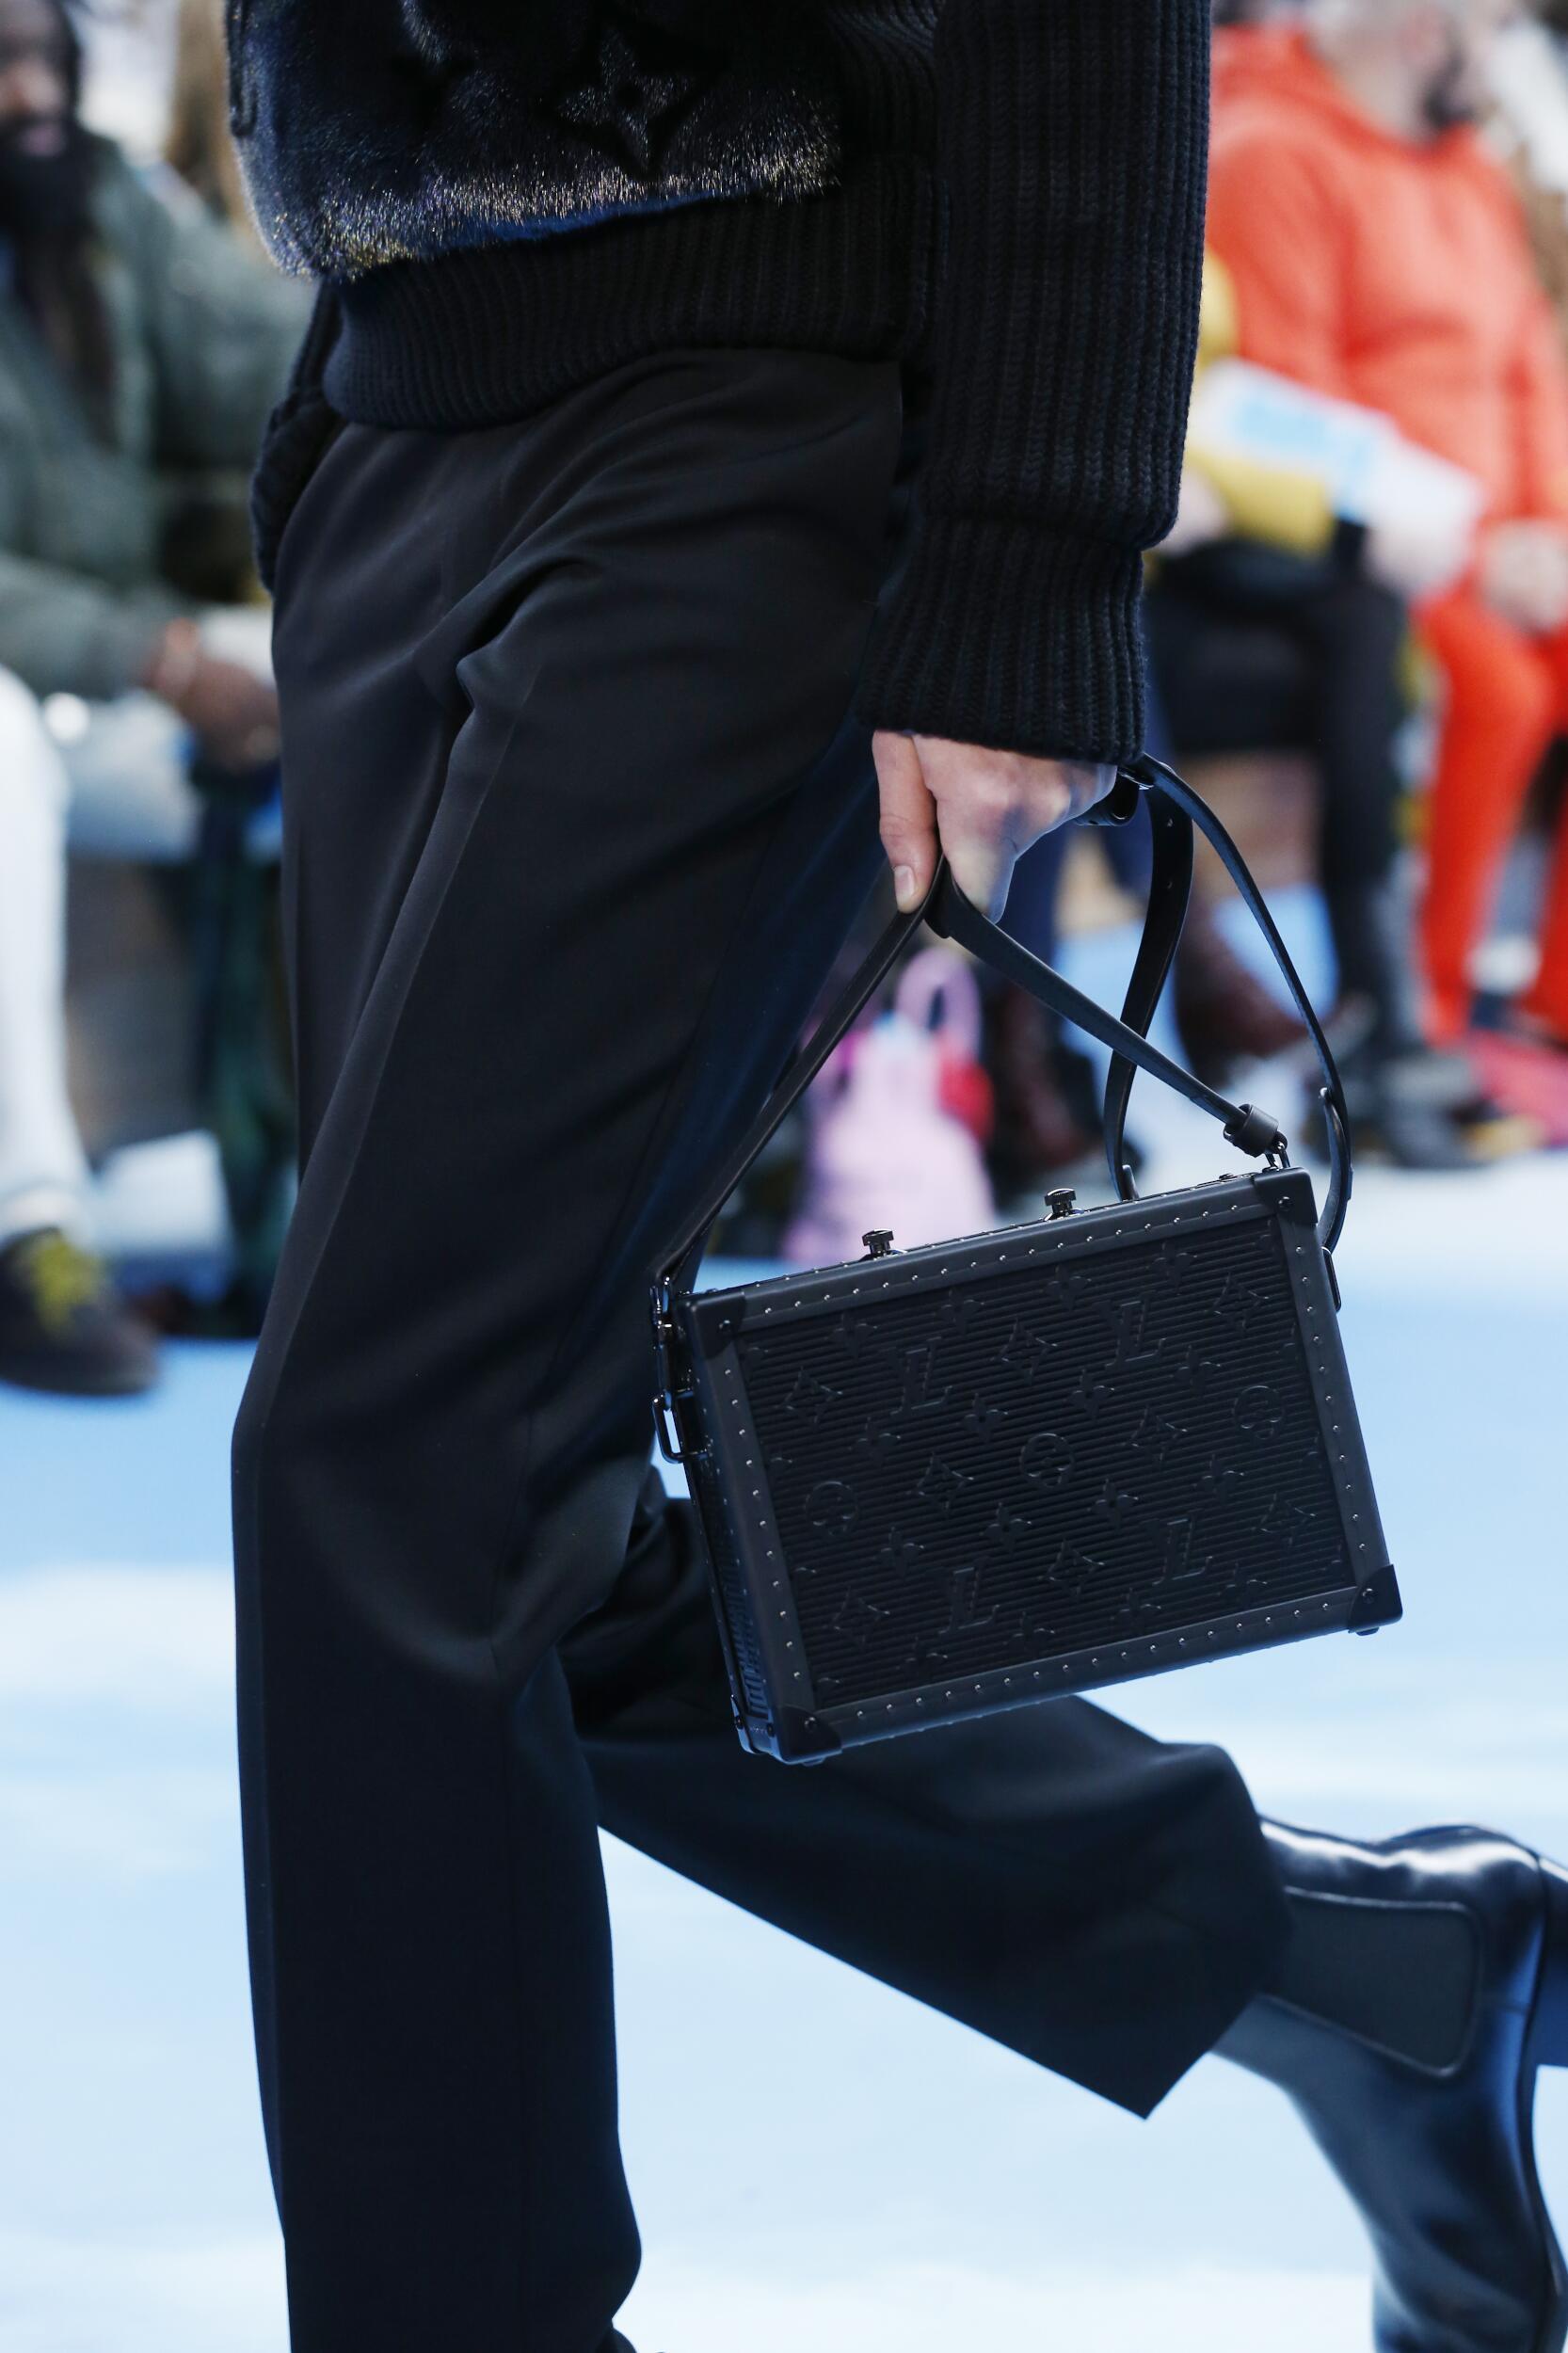 Menswear Handbag Louis Vuitton